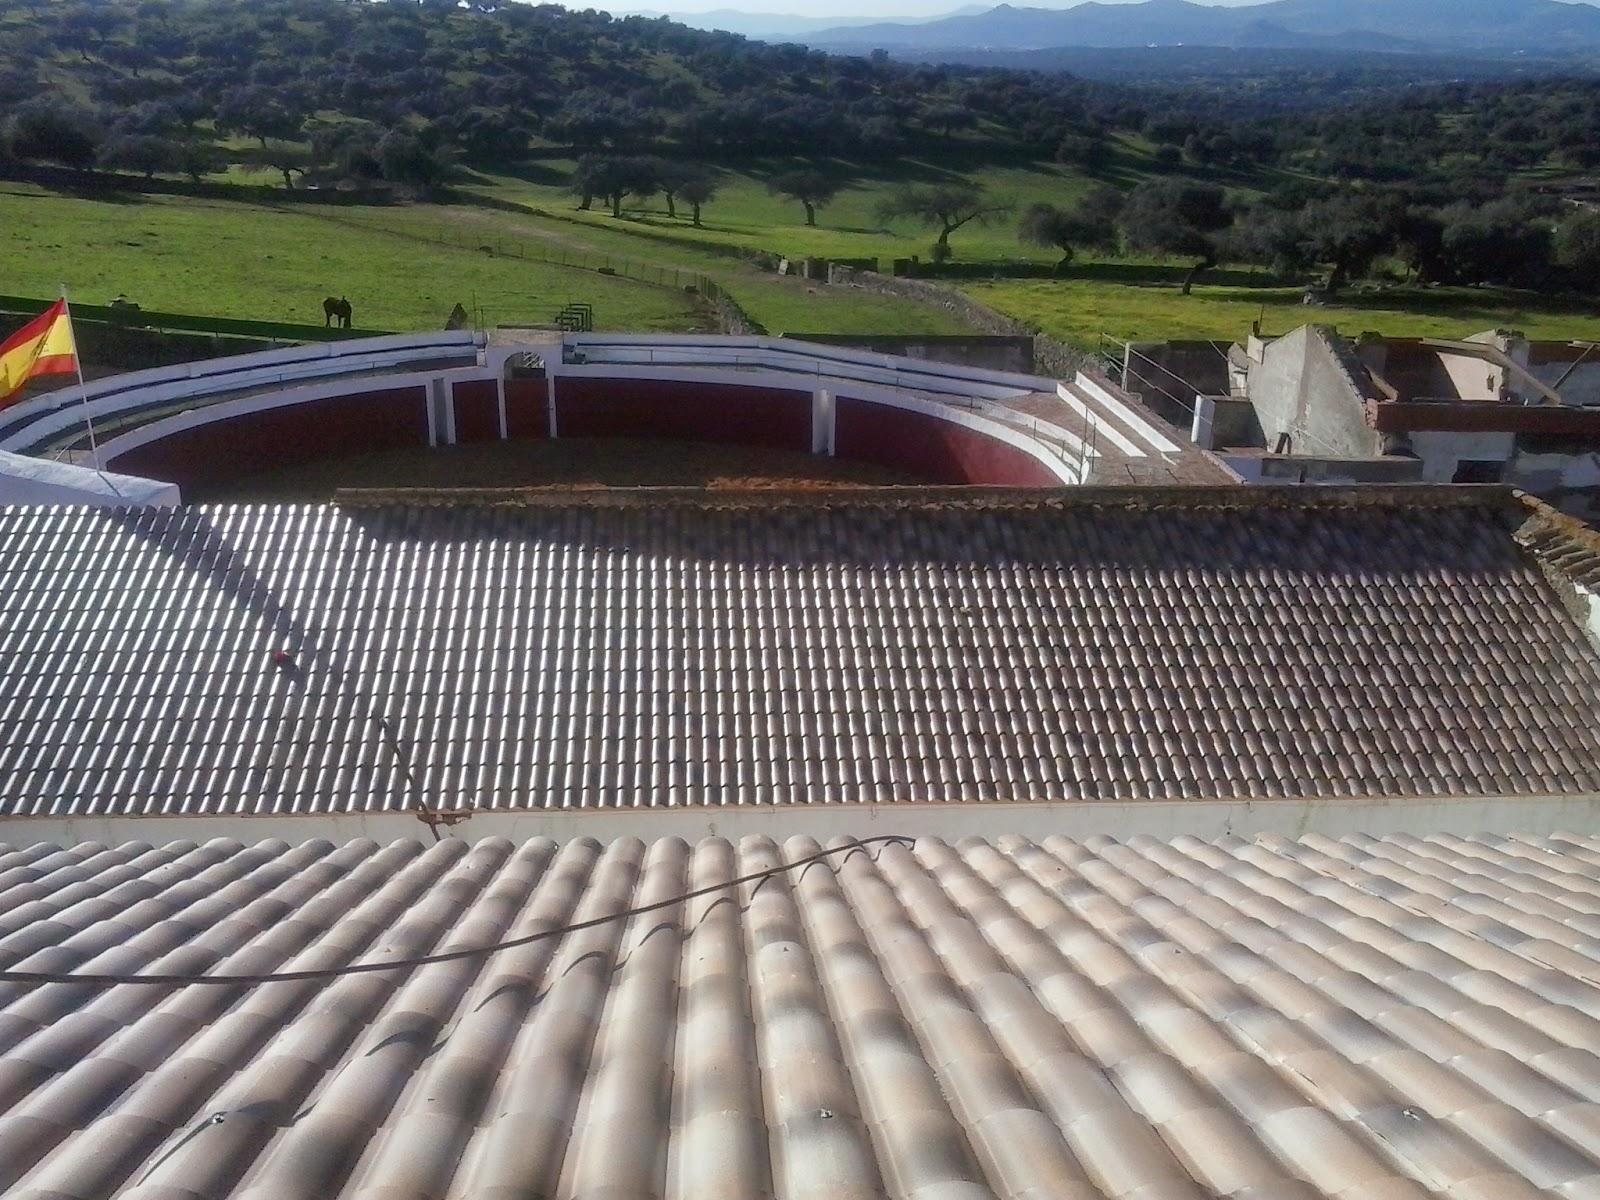 Cubiertas de panel s ndwich imitaci n teja para el tejado for Cubiertas de panel sandwich imitacion teja